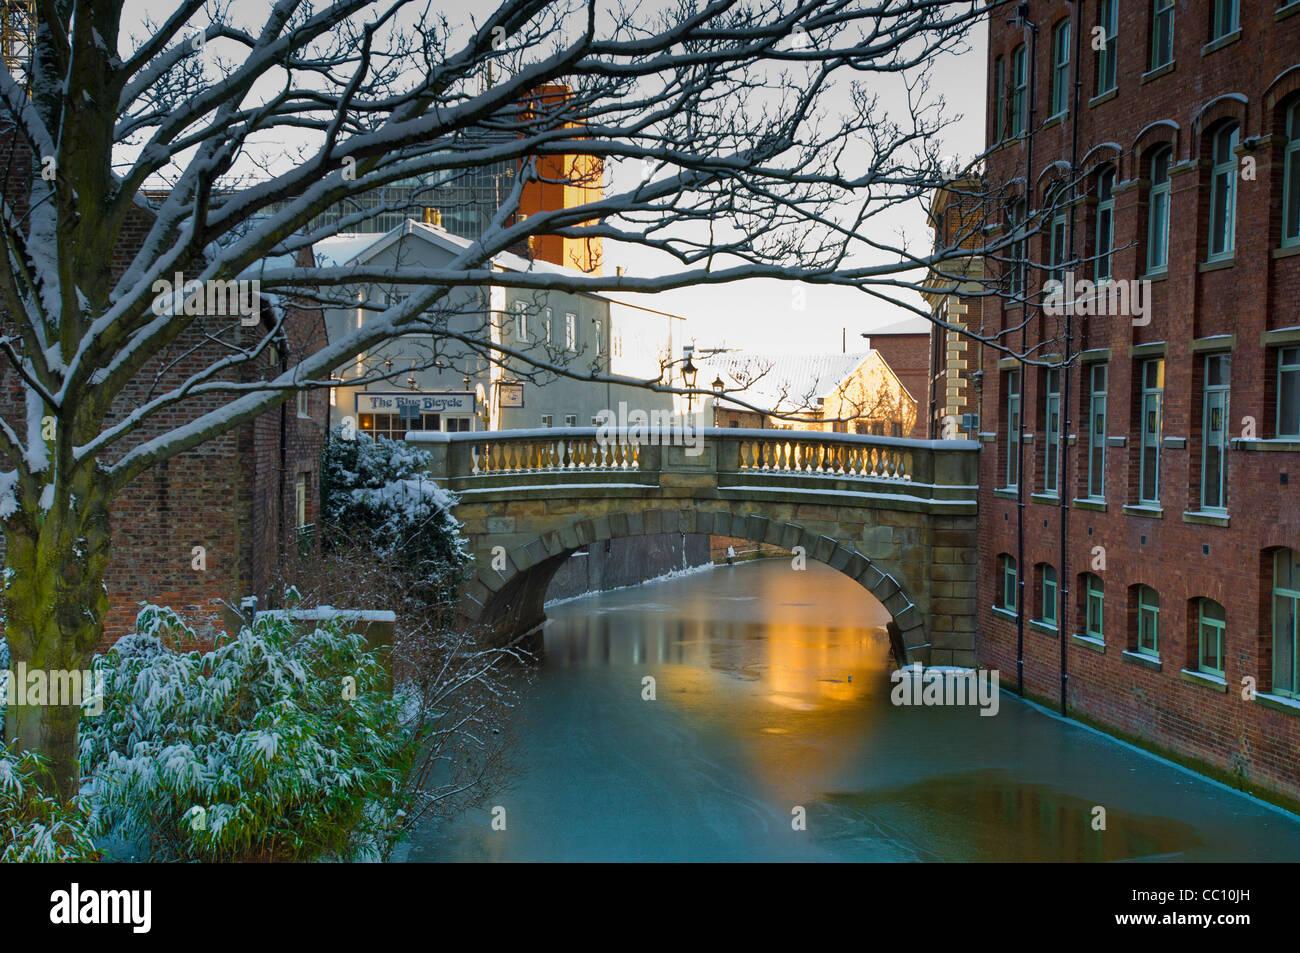 Bridge over frozen river Foss in Fossgate, york. - Stock Image